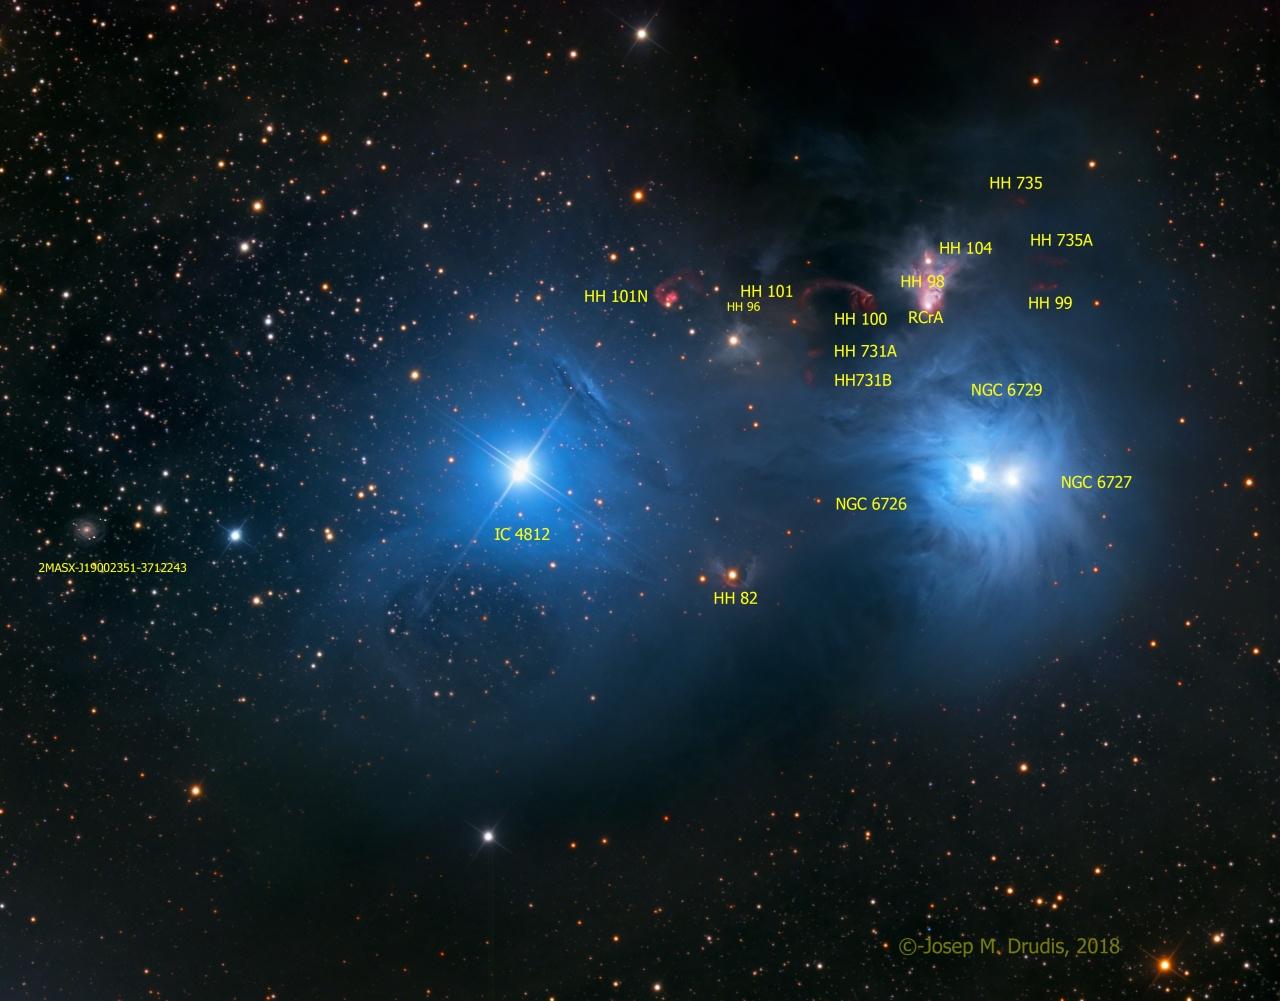 NGC6727-SL-Ha-RHaGB-07D-Final7-Cr-Cc-Annot